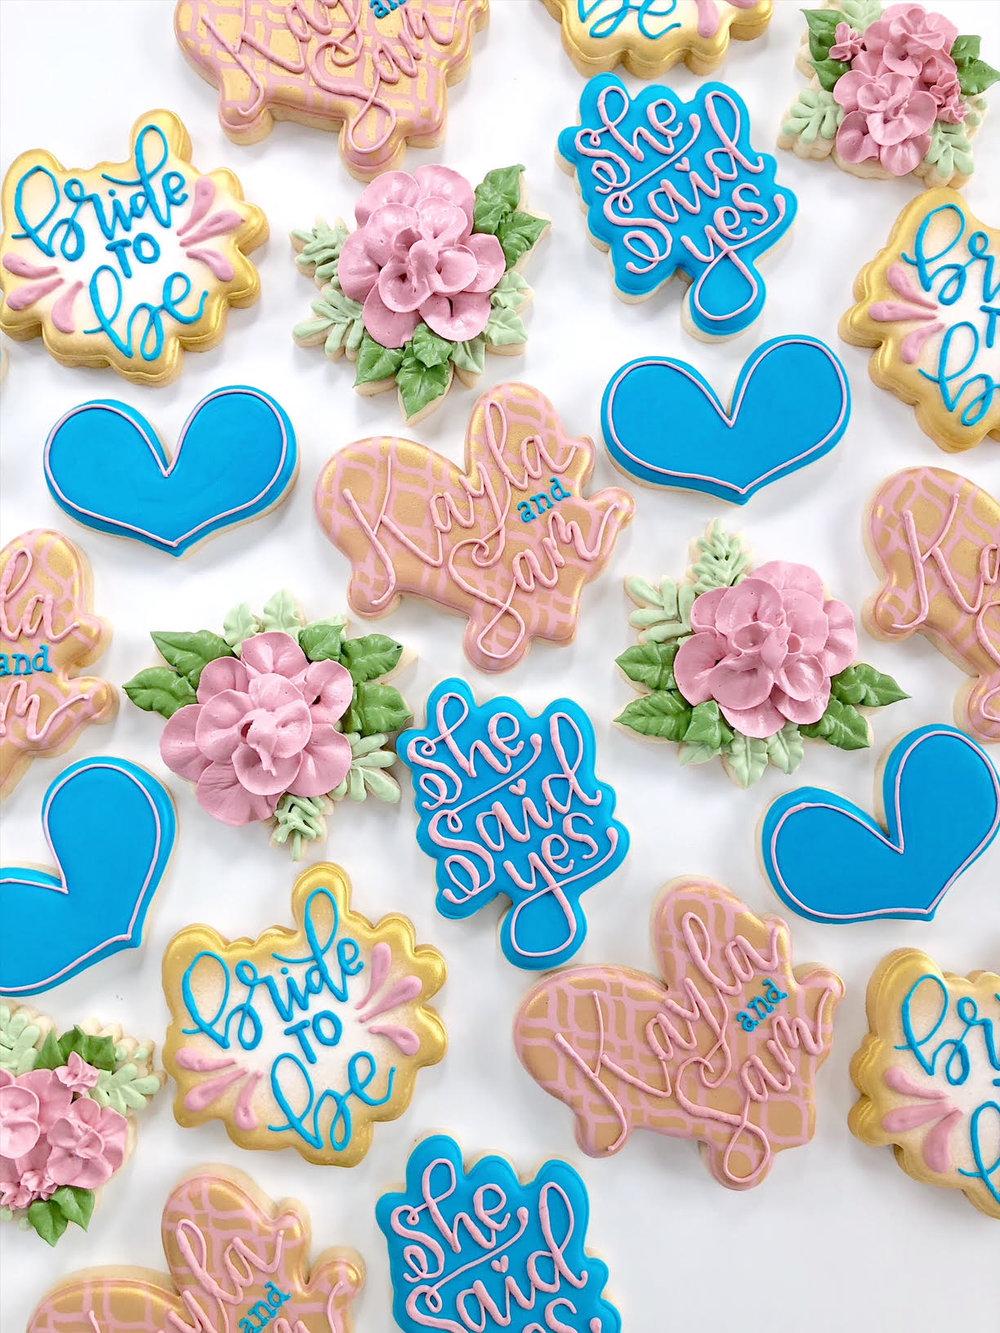 houston_wedding_cookies.jpg